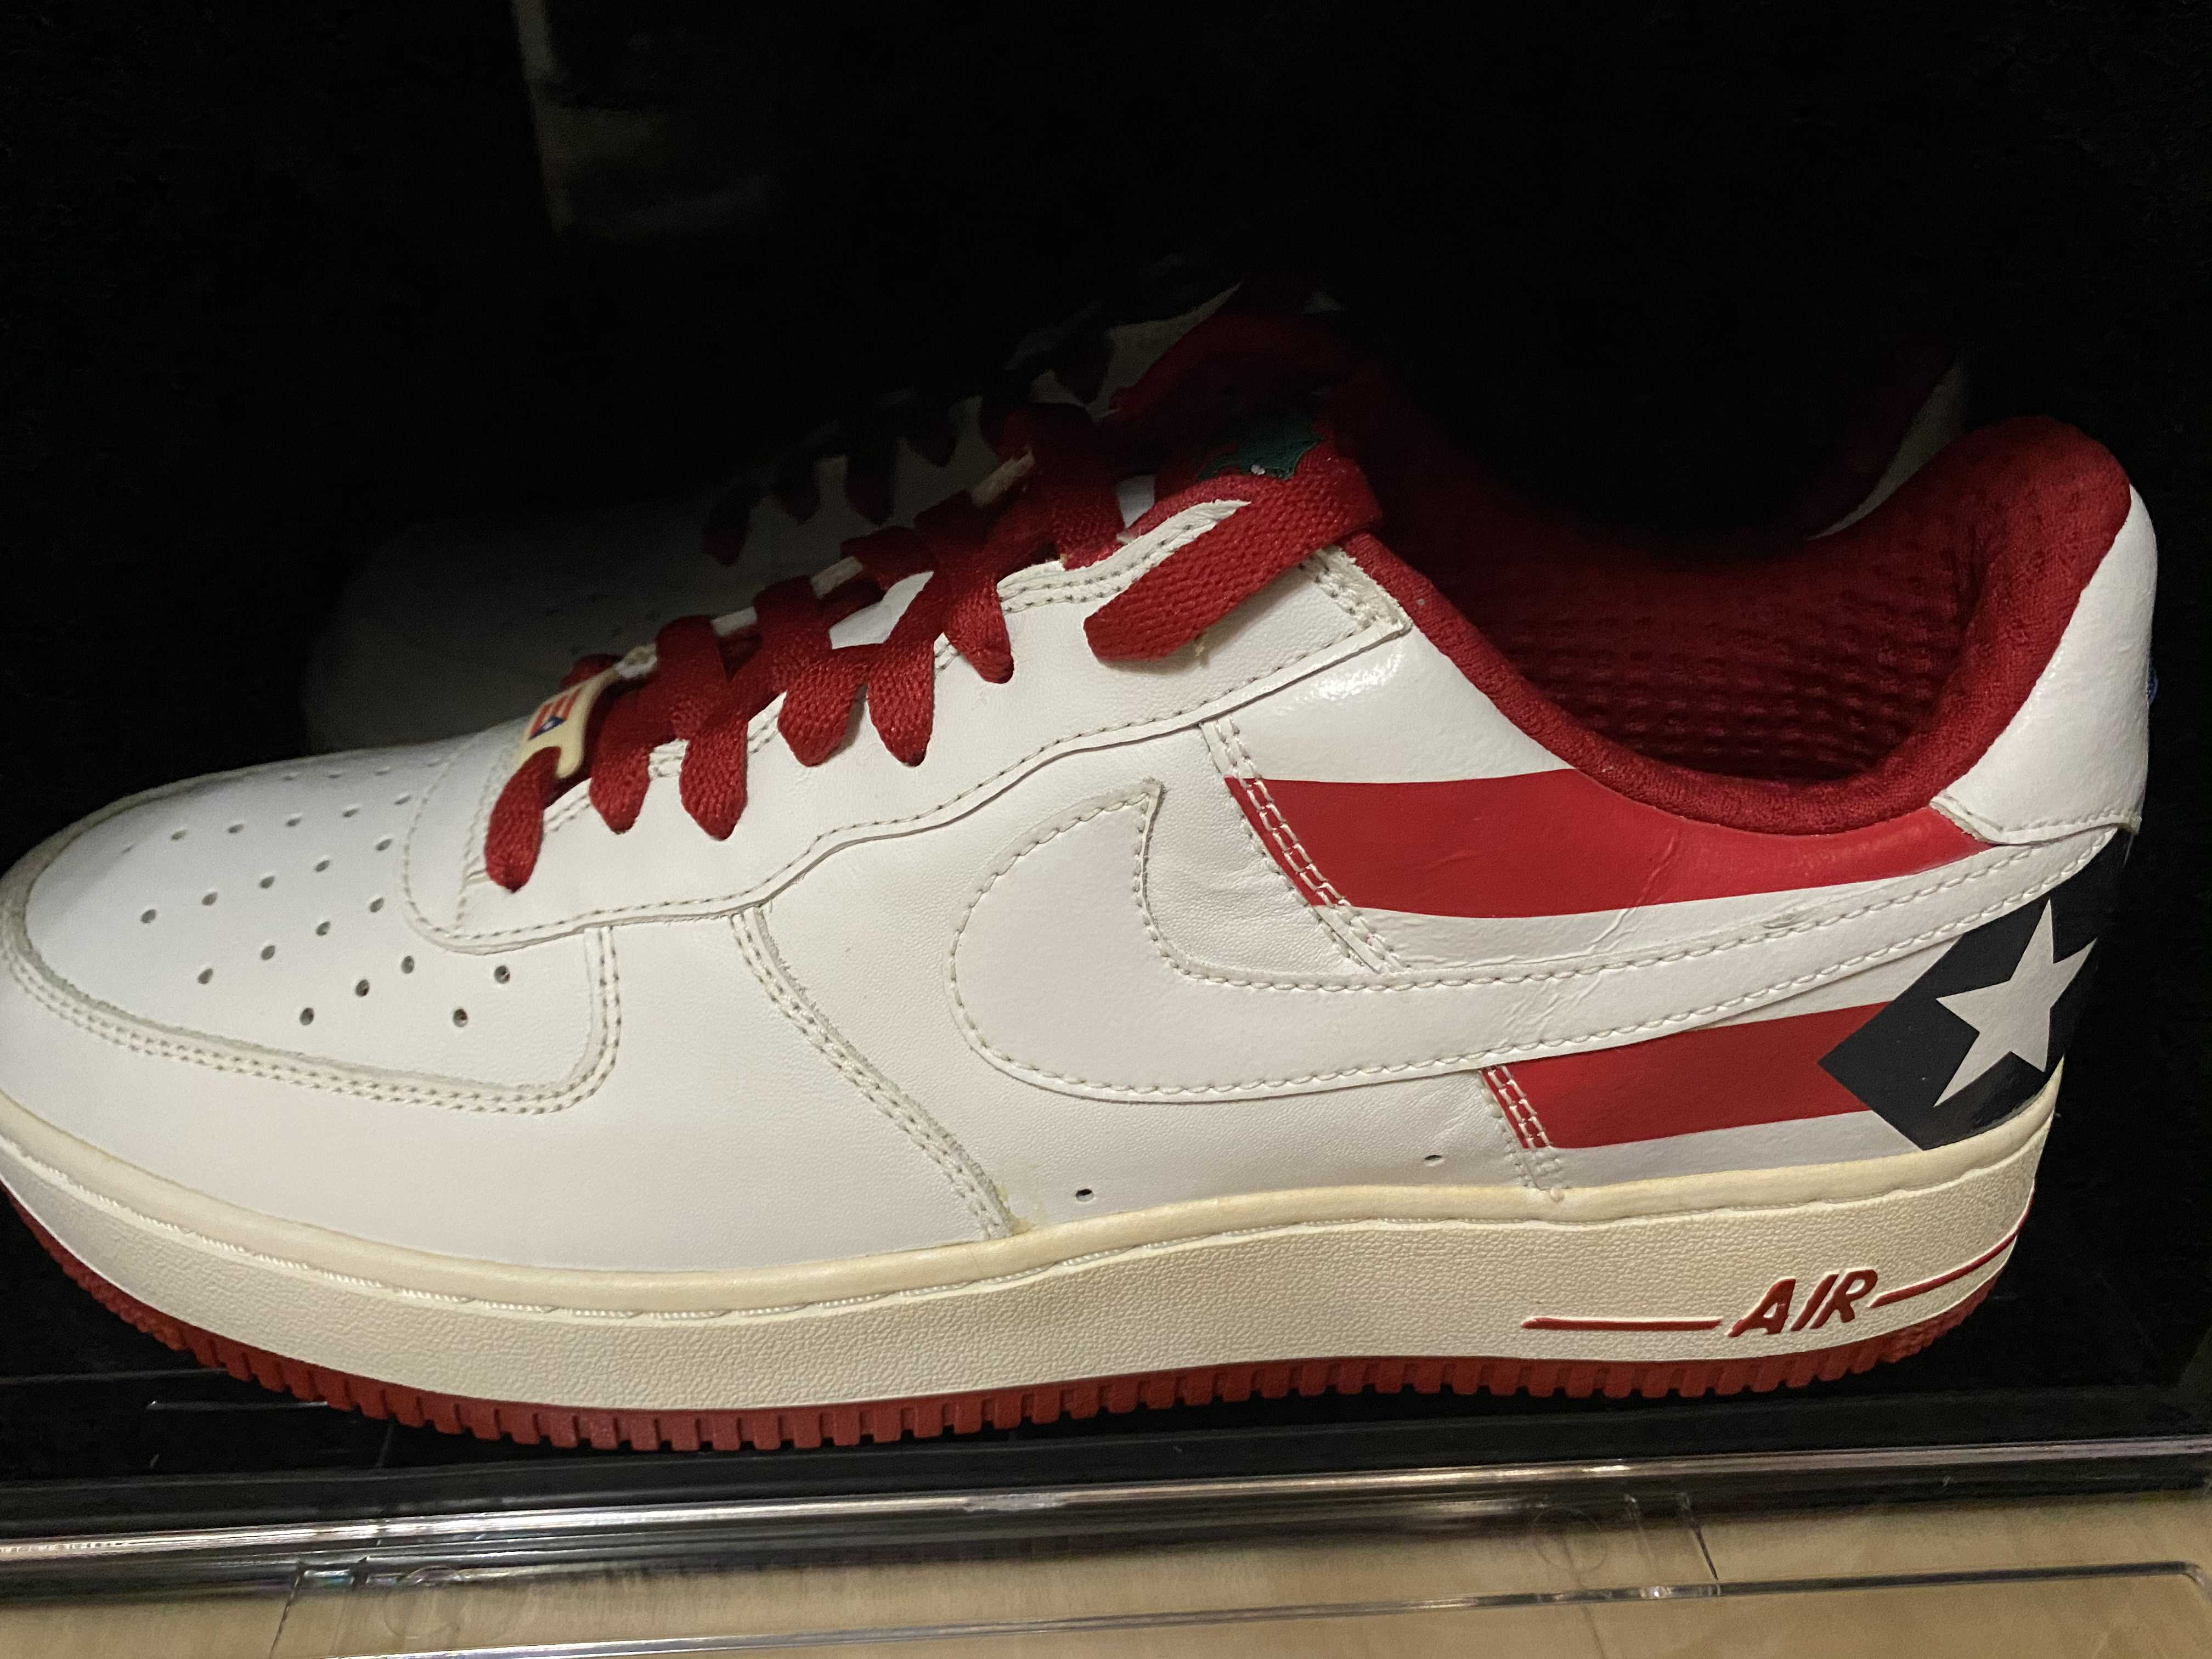 Nike Air Force 1 Puerto Rico 7